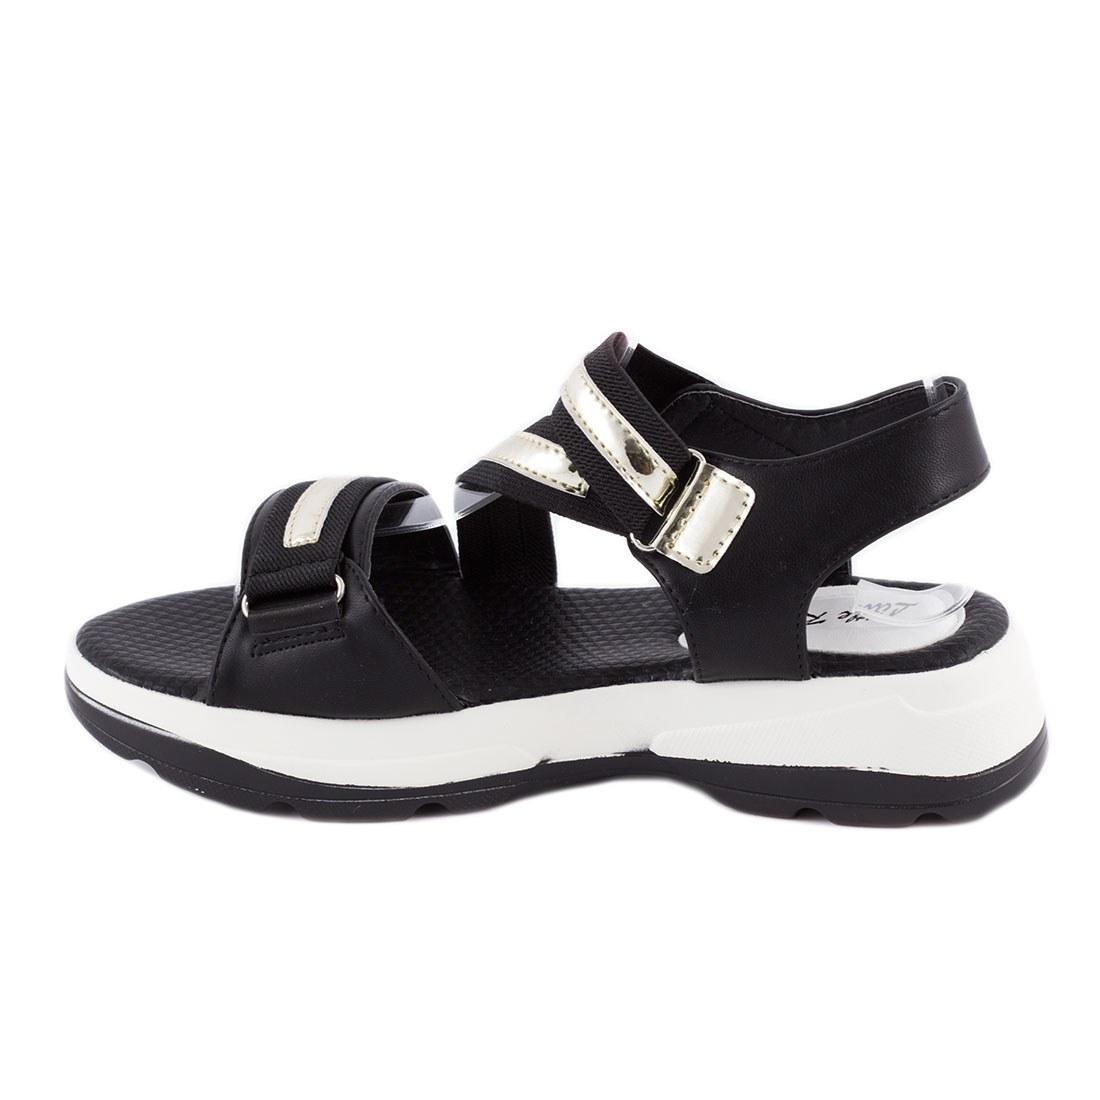 Sandale de dama comode GH380-GOLD